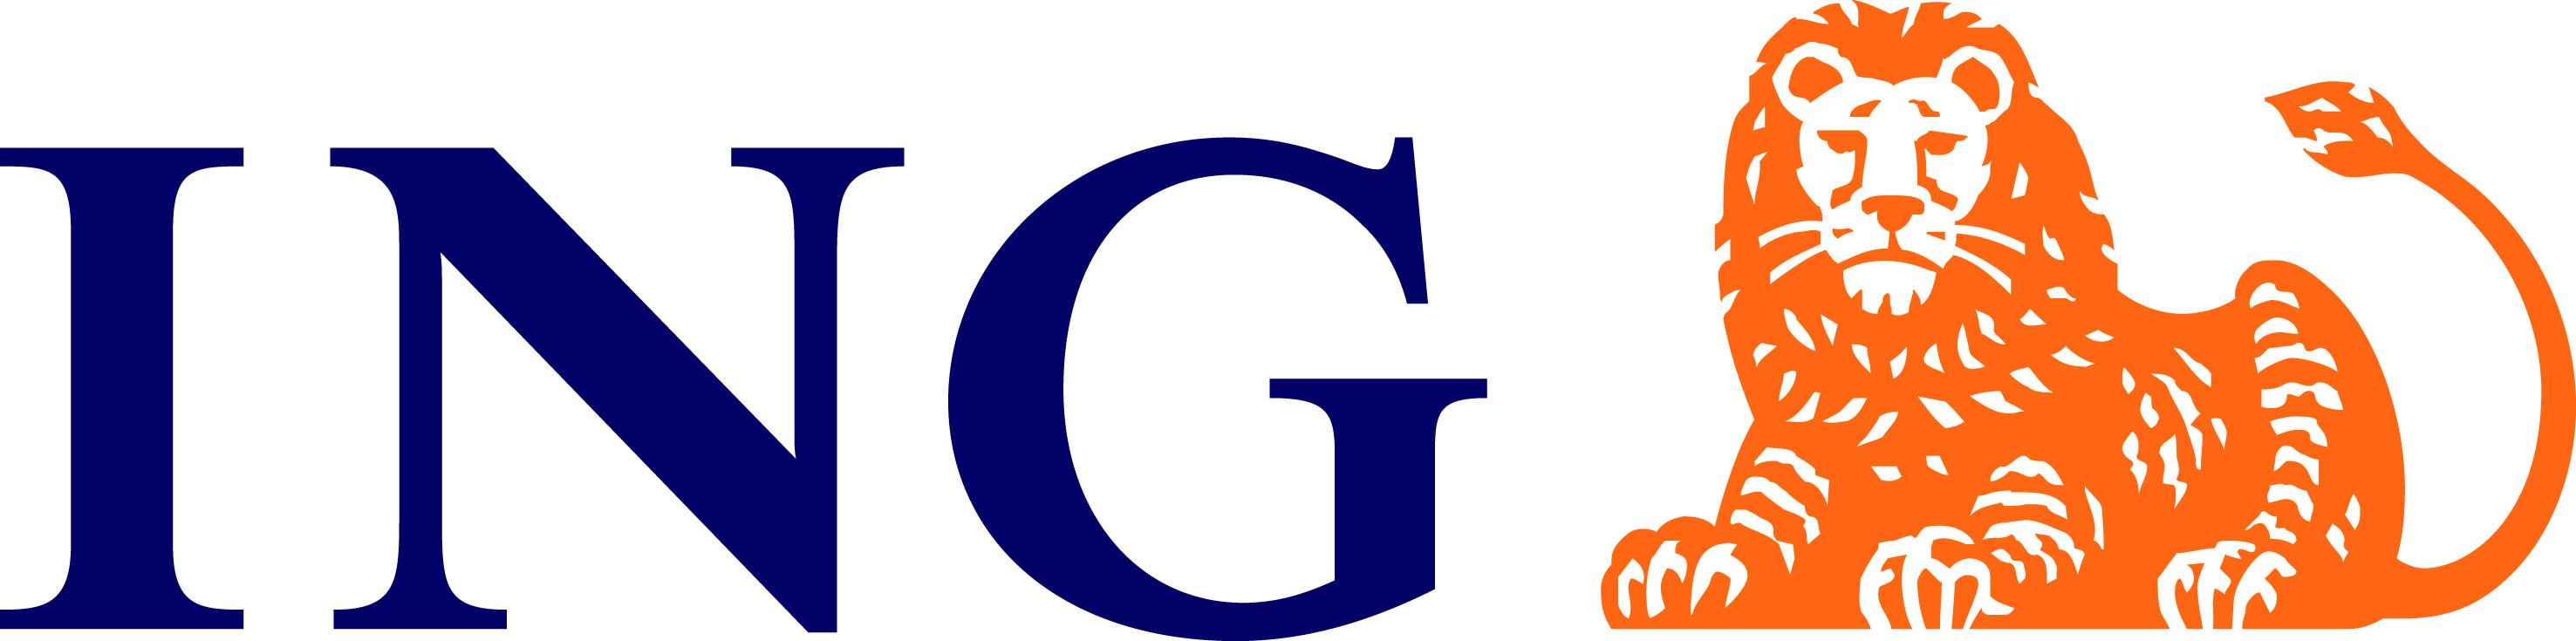 Forex vs gpw